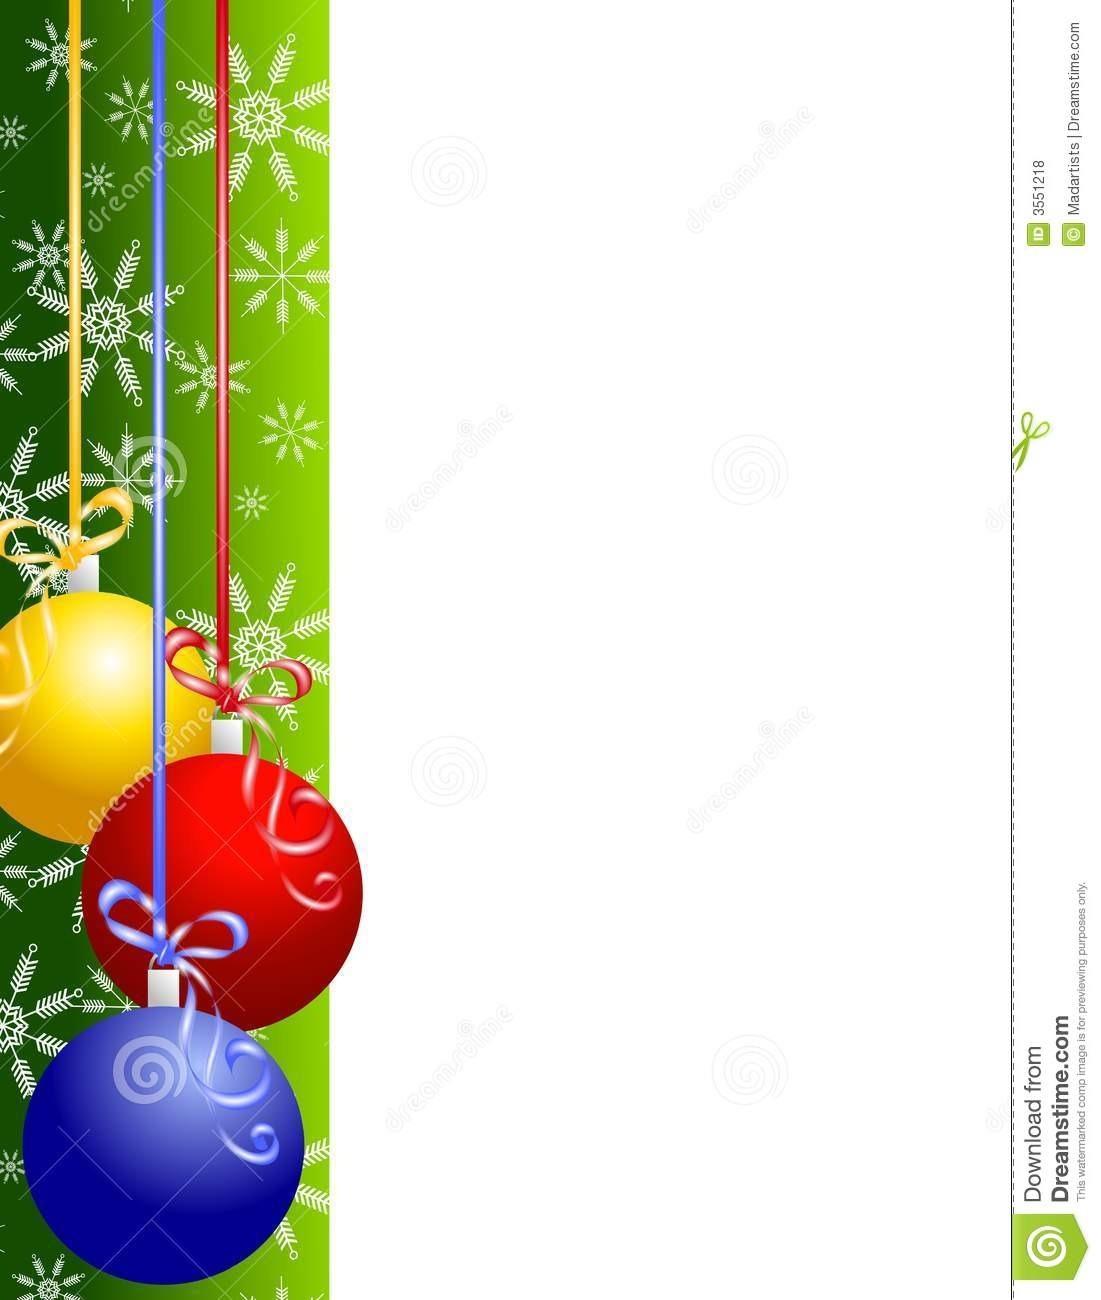 Christmas Border Decorations Clipart.